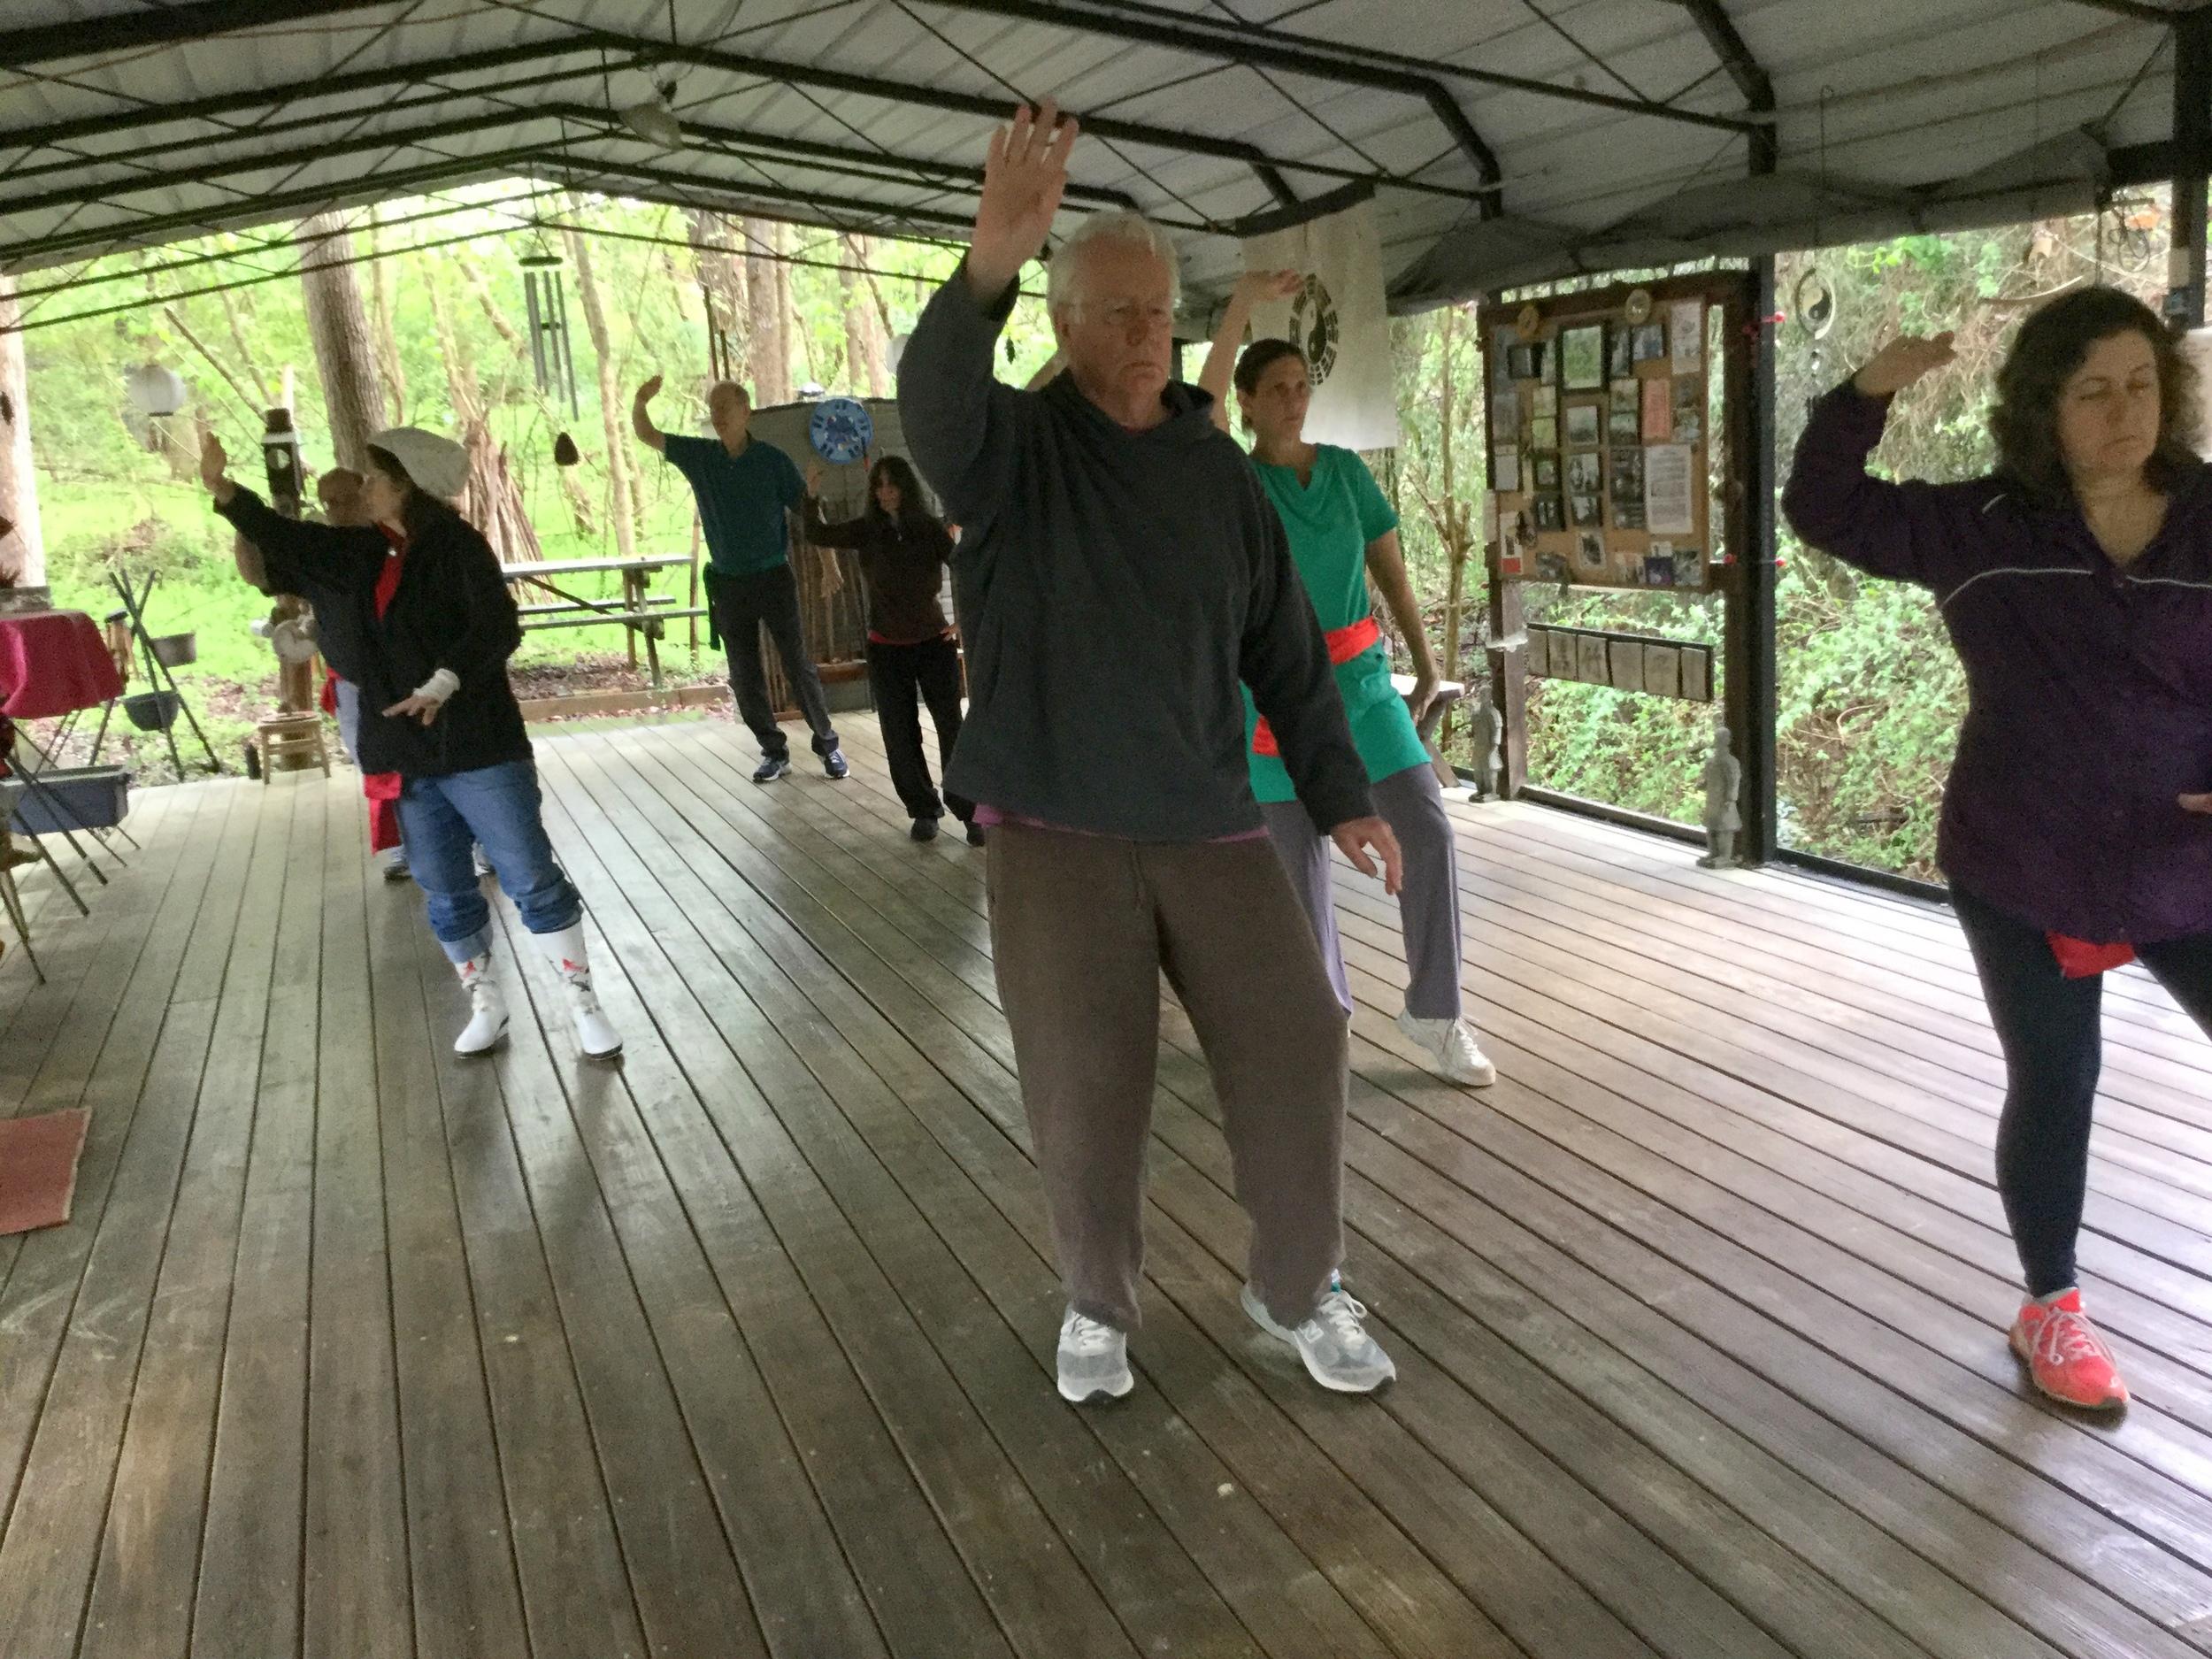 Taiji at Black Bamboo Pavilion